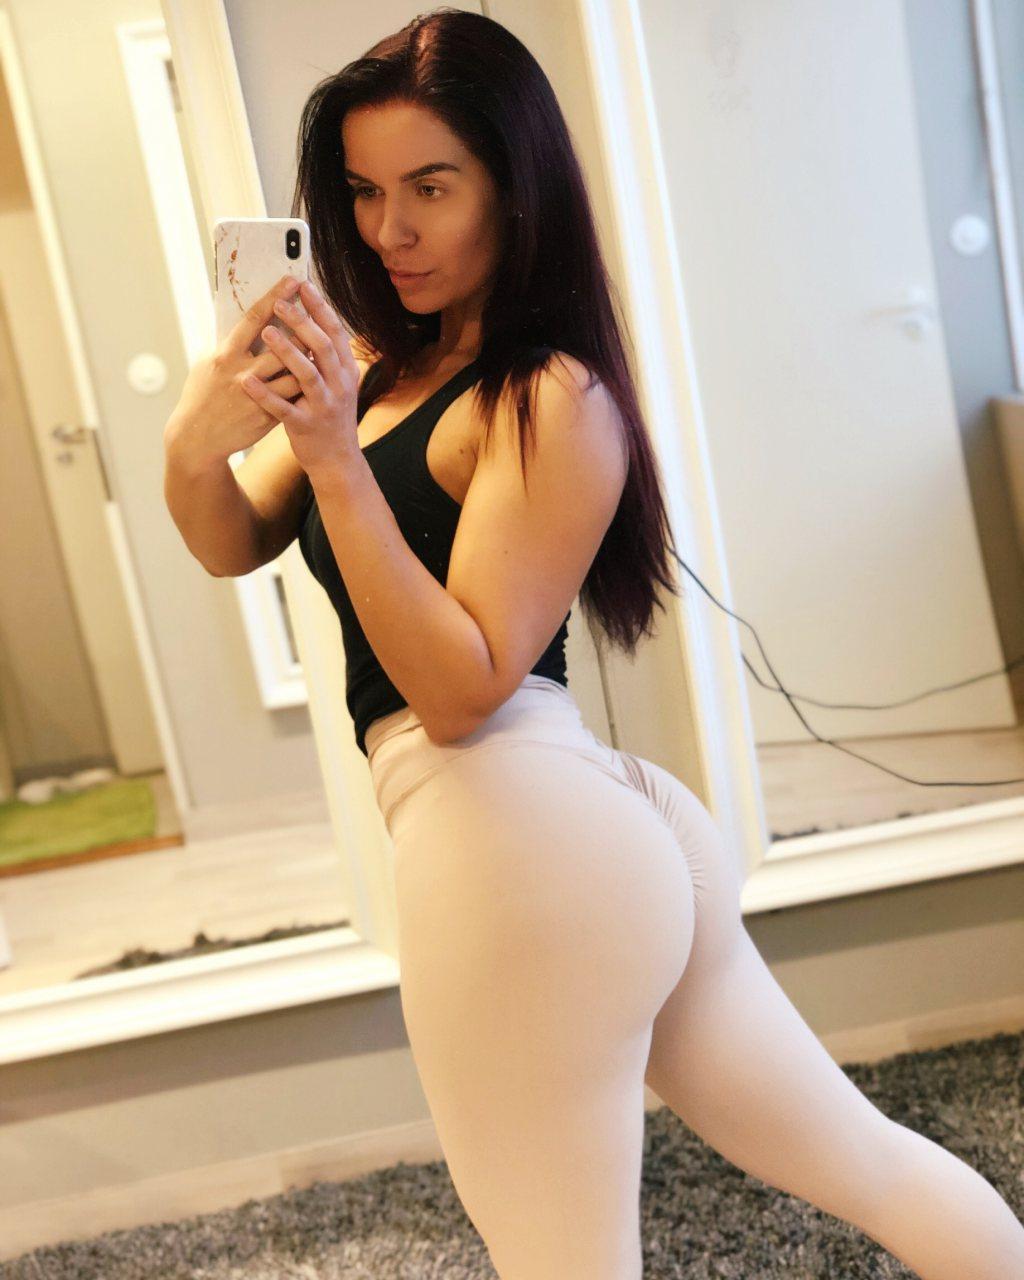 bikinifitness-treeni-sali-fitnessurheilu